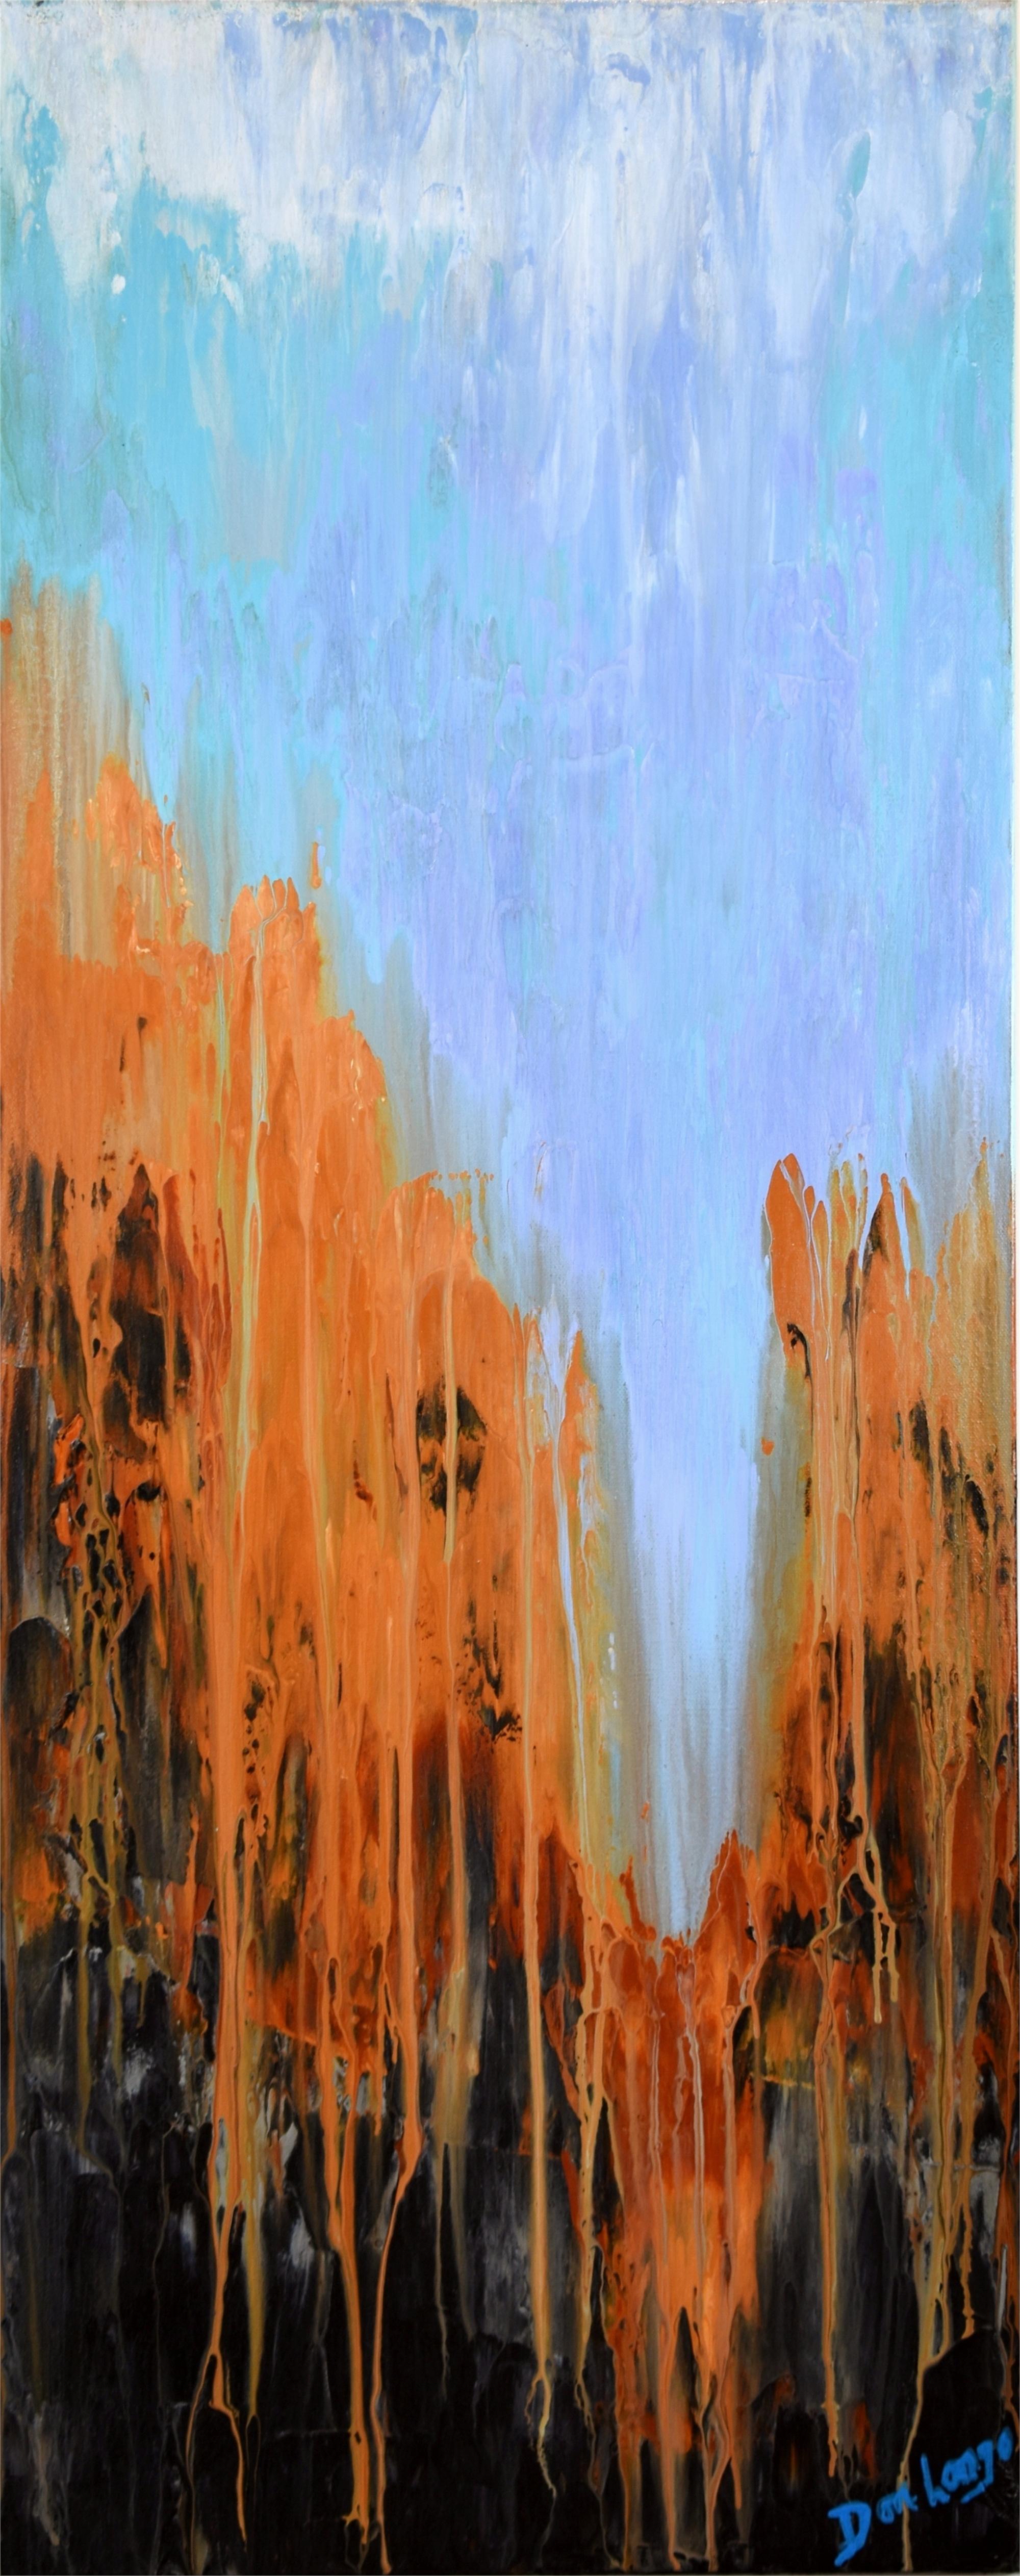 Mystic Rain by Don Longo